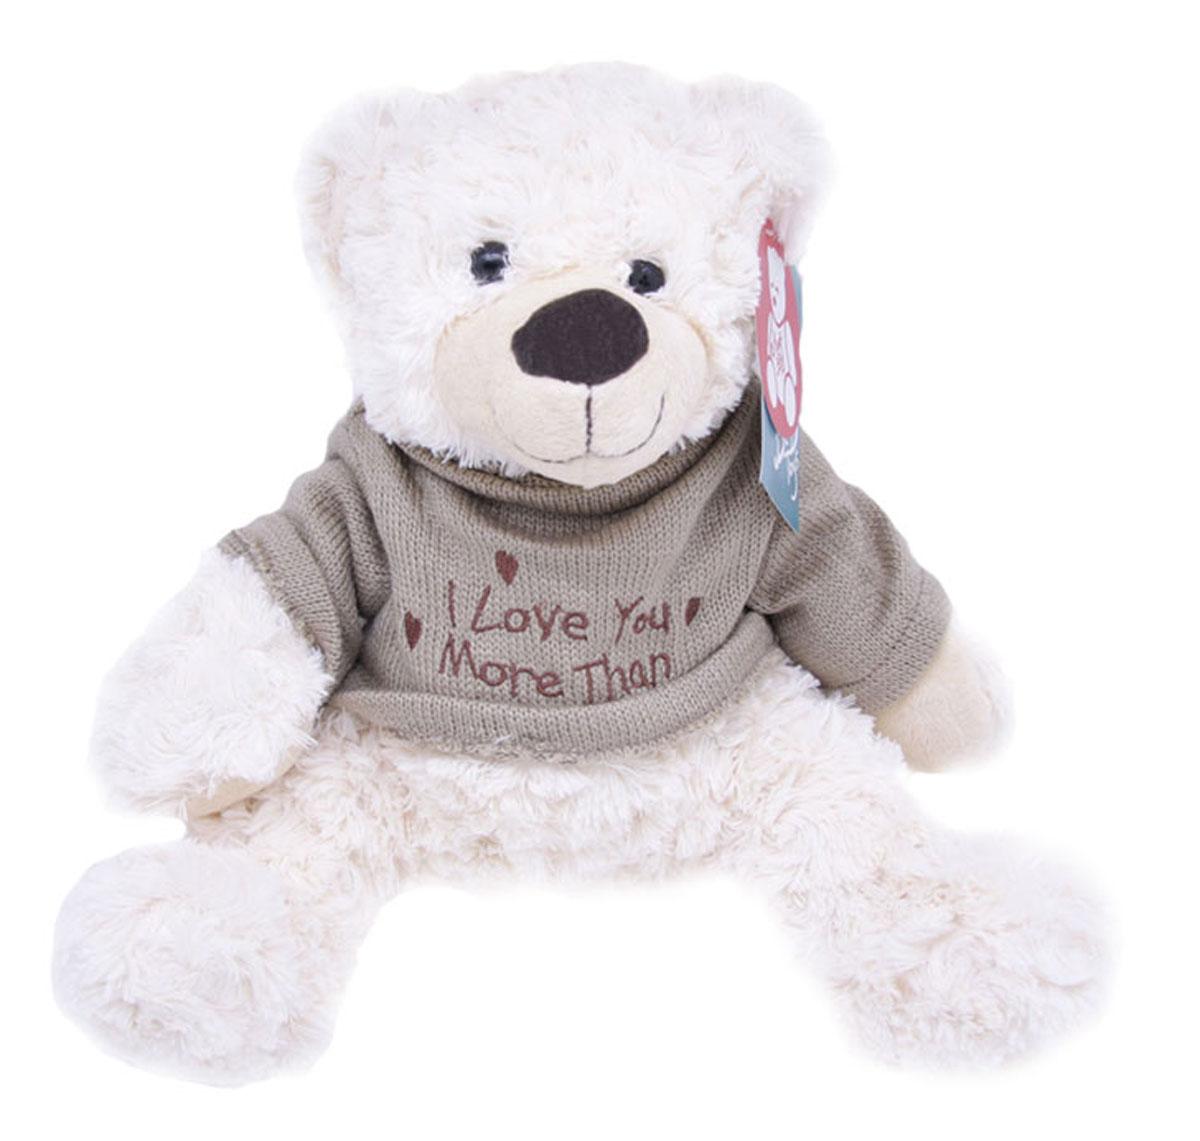 Magic Bear Toys Мягкая игрушка Мишка Этан в свитере 28 см 1 piece light brown high quality low price stuffed plush toys large size100cm teddy bear 1m big bear doll lovers birthday gift